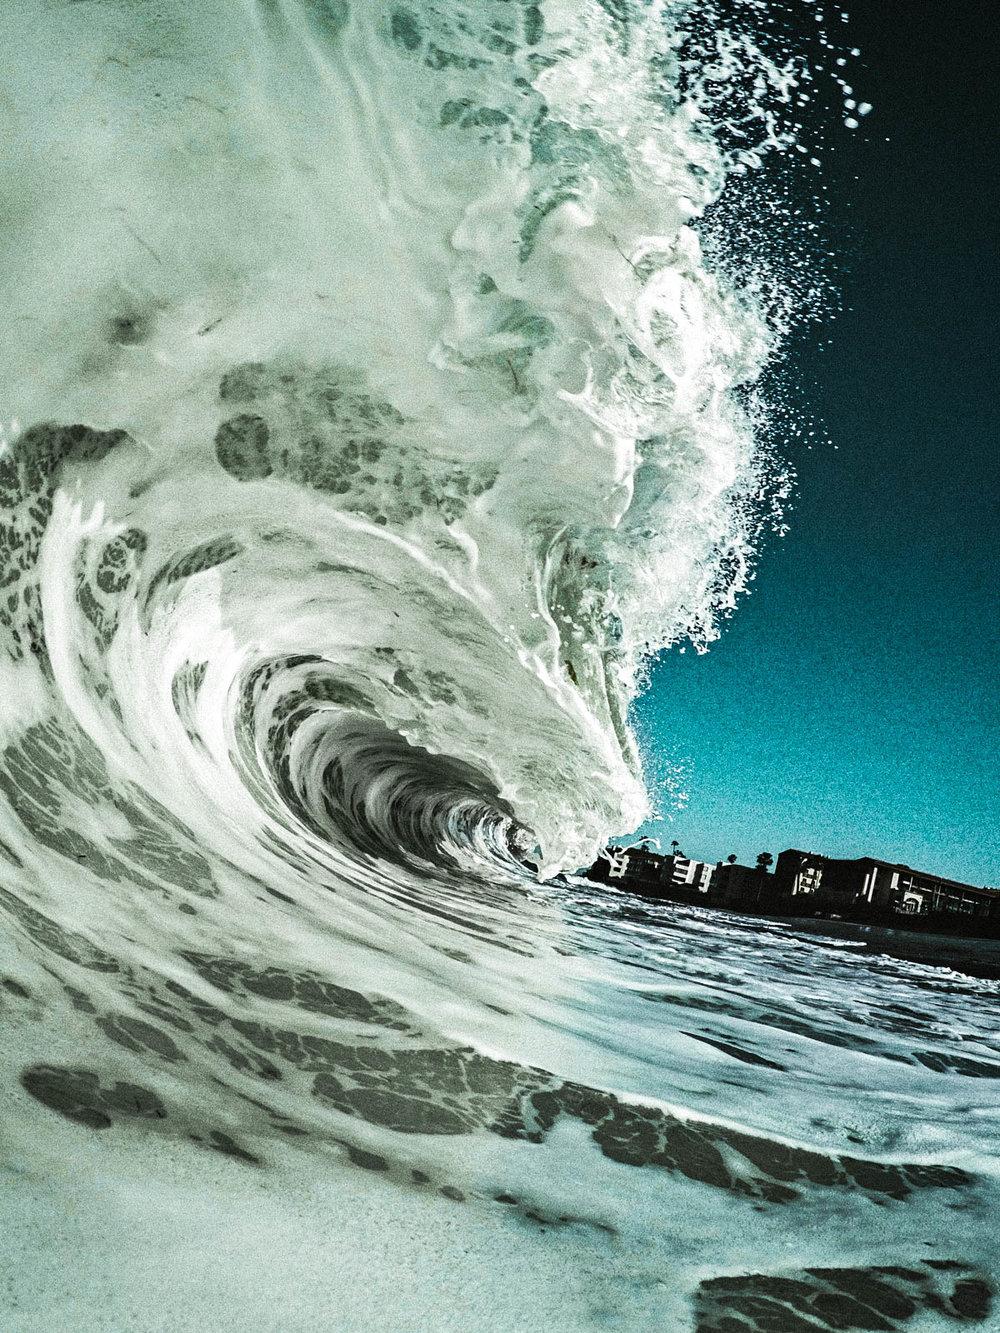 unsettle-co-lifestyle-blog-snapshots-interview-Matthew-Lawless-waves-barrels